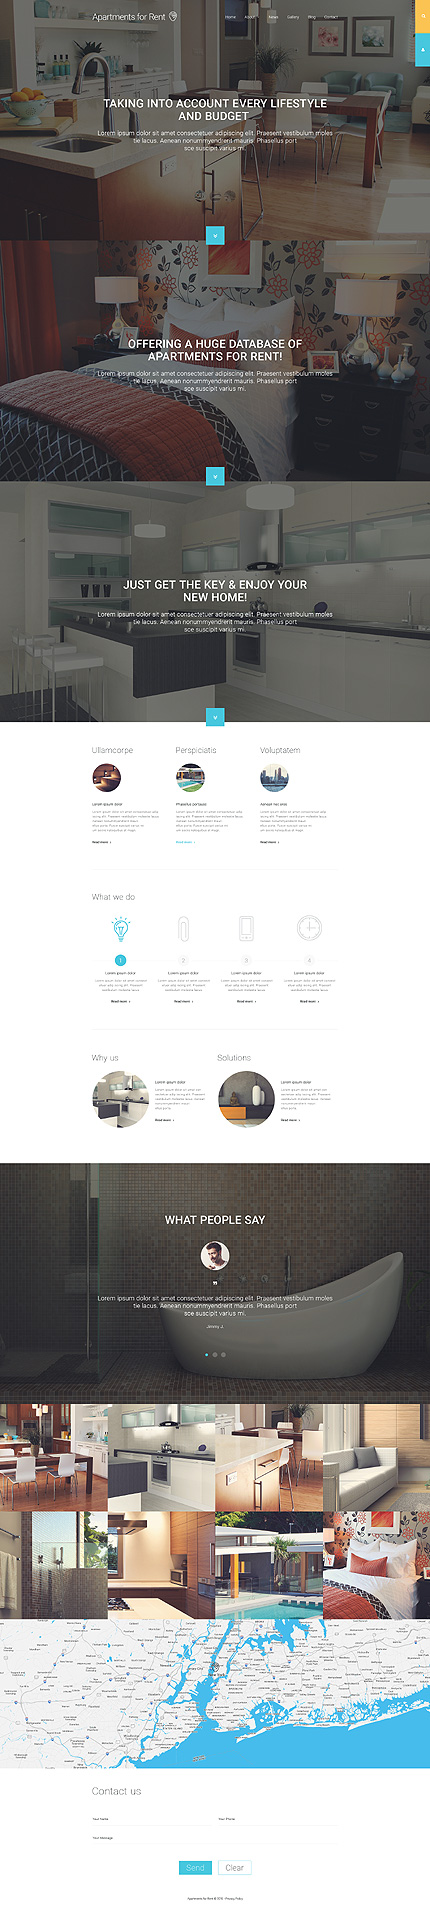 Joomla Theme/Template 55436 Main Page Screenshot